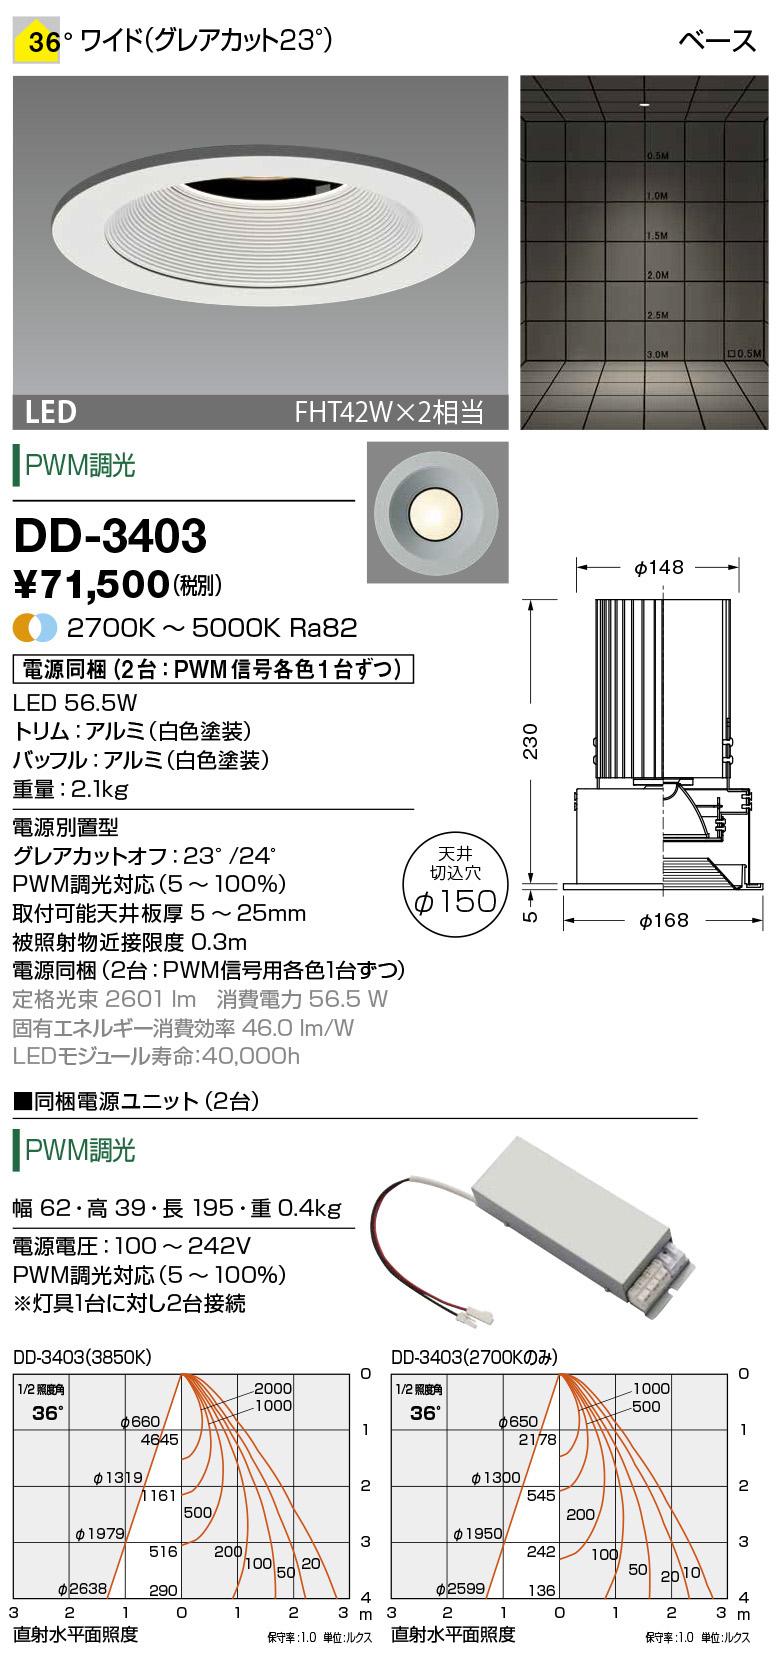 DD-3403 山田照明 照明器具 LED一体型ダウンライト モルフシリーズ ベースタイプ 調色調光タイプ FHT42W×2相当